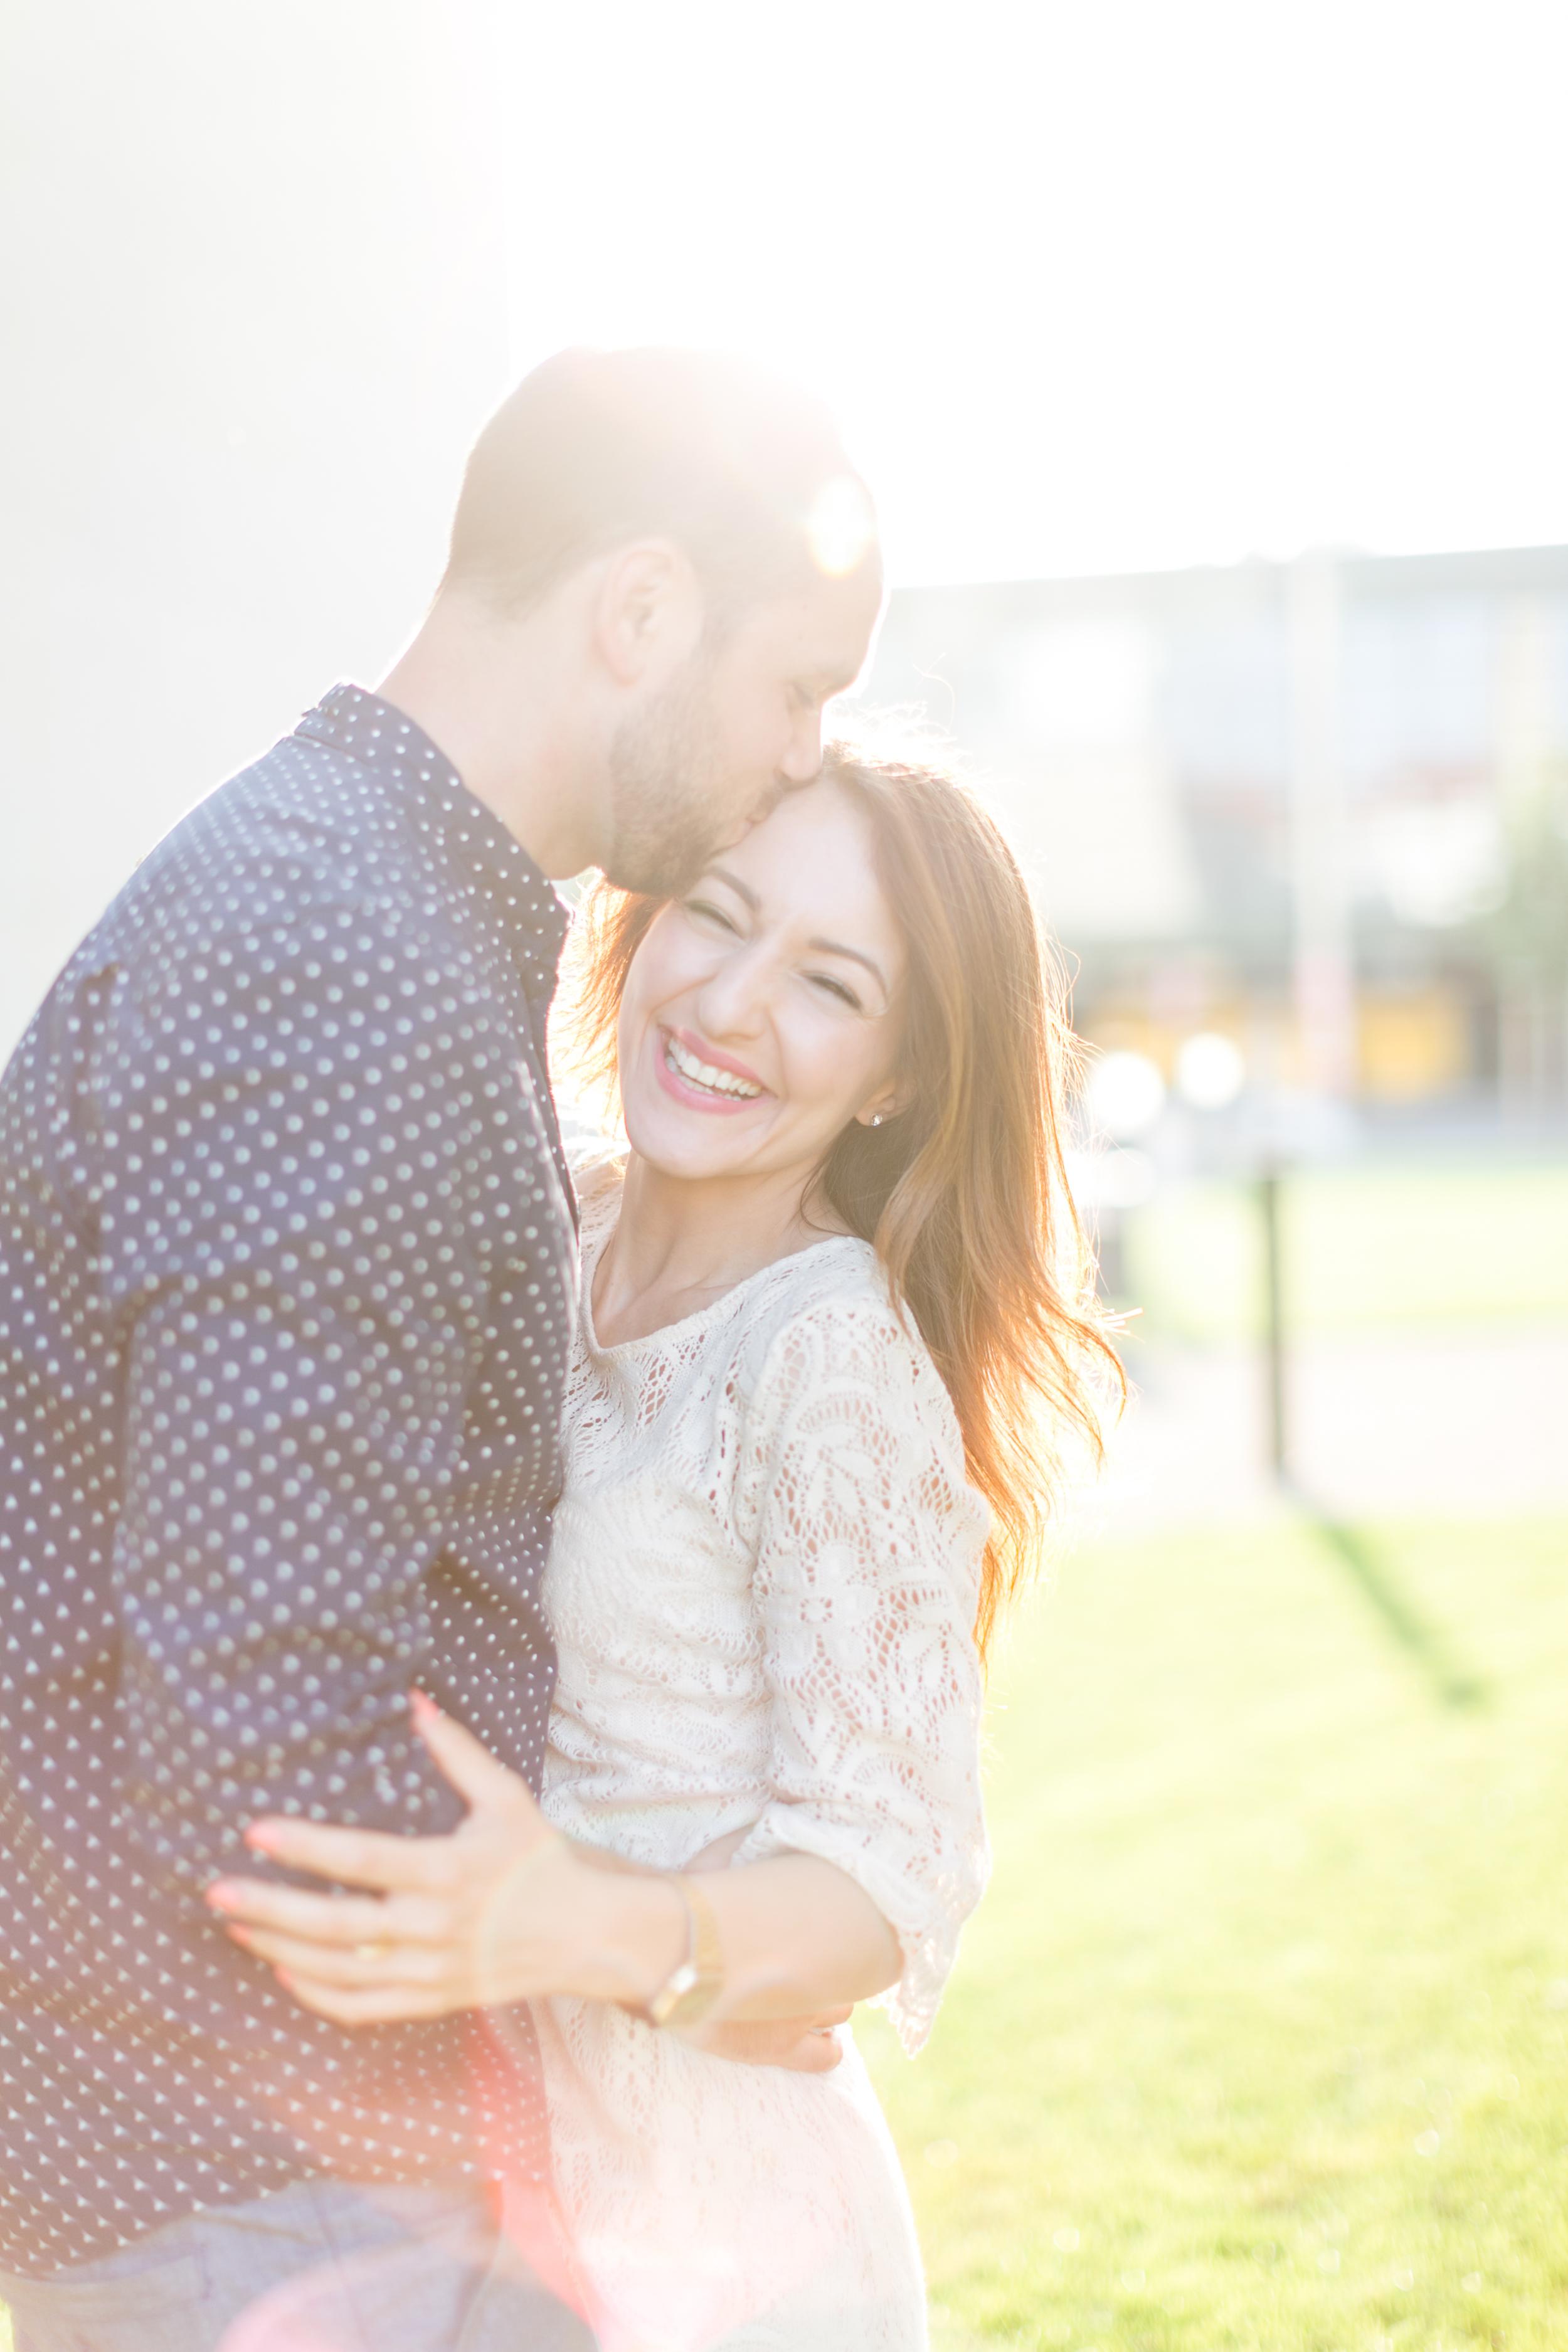 coupleshoot-munich-fun-kiss.jpg